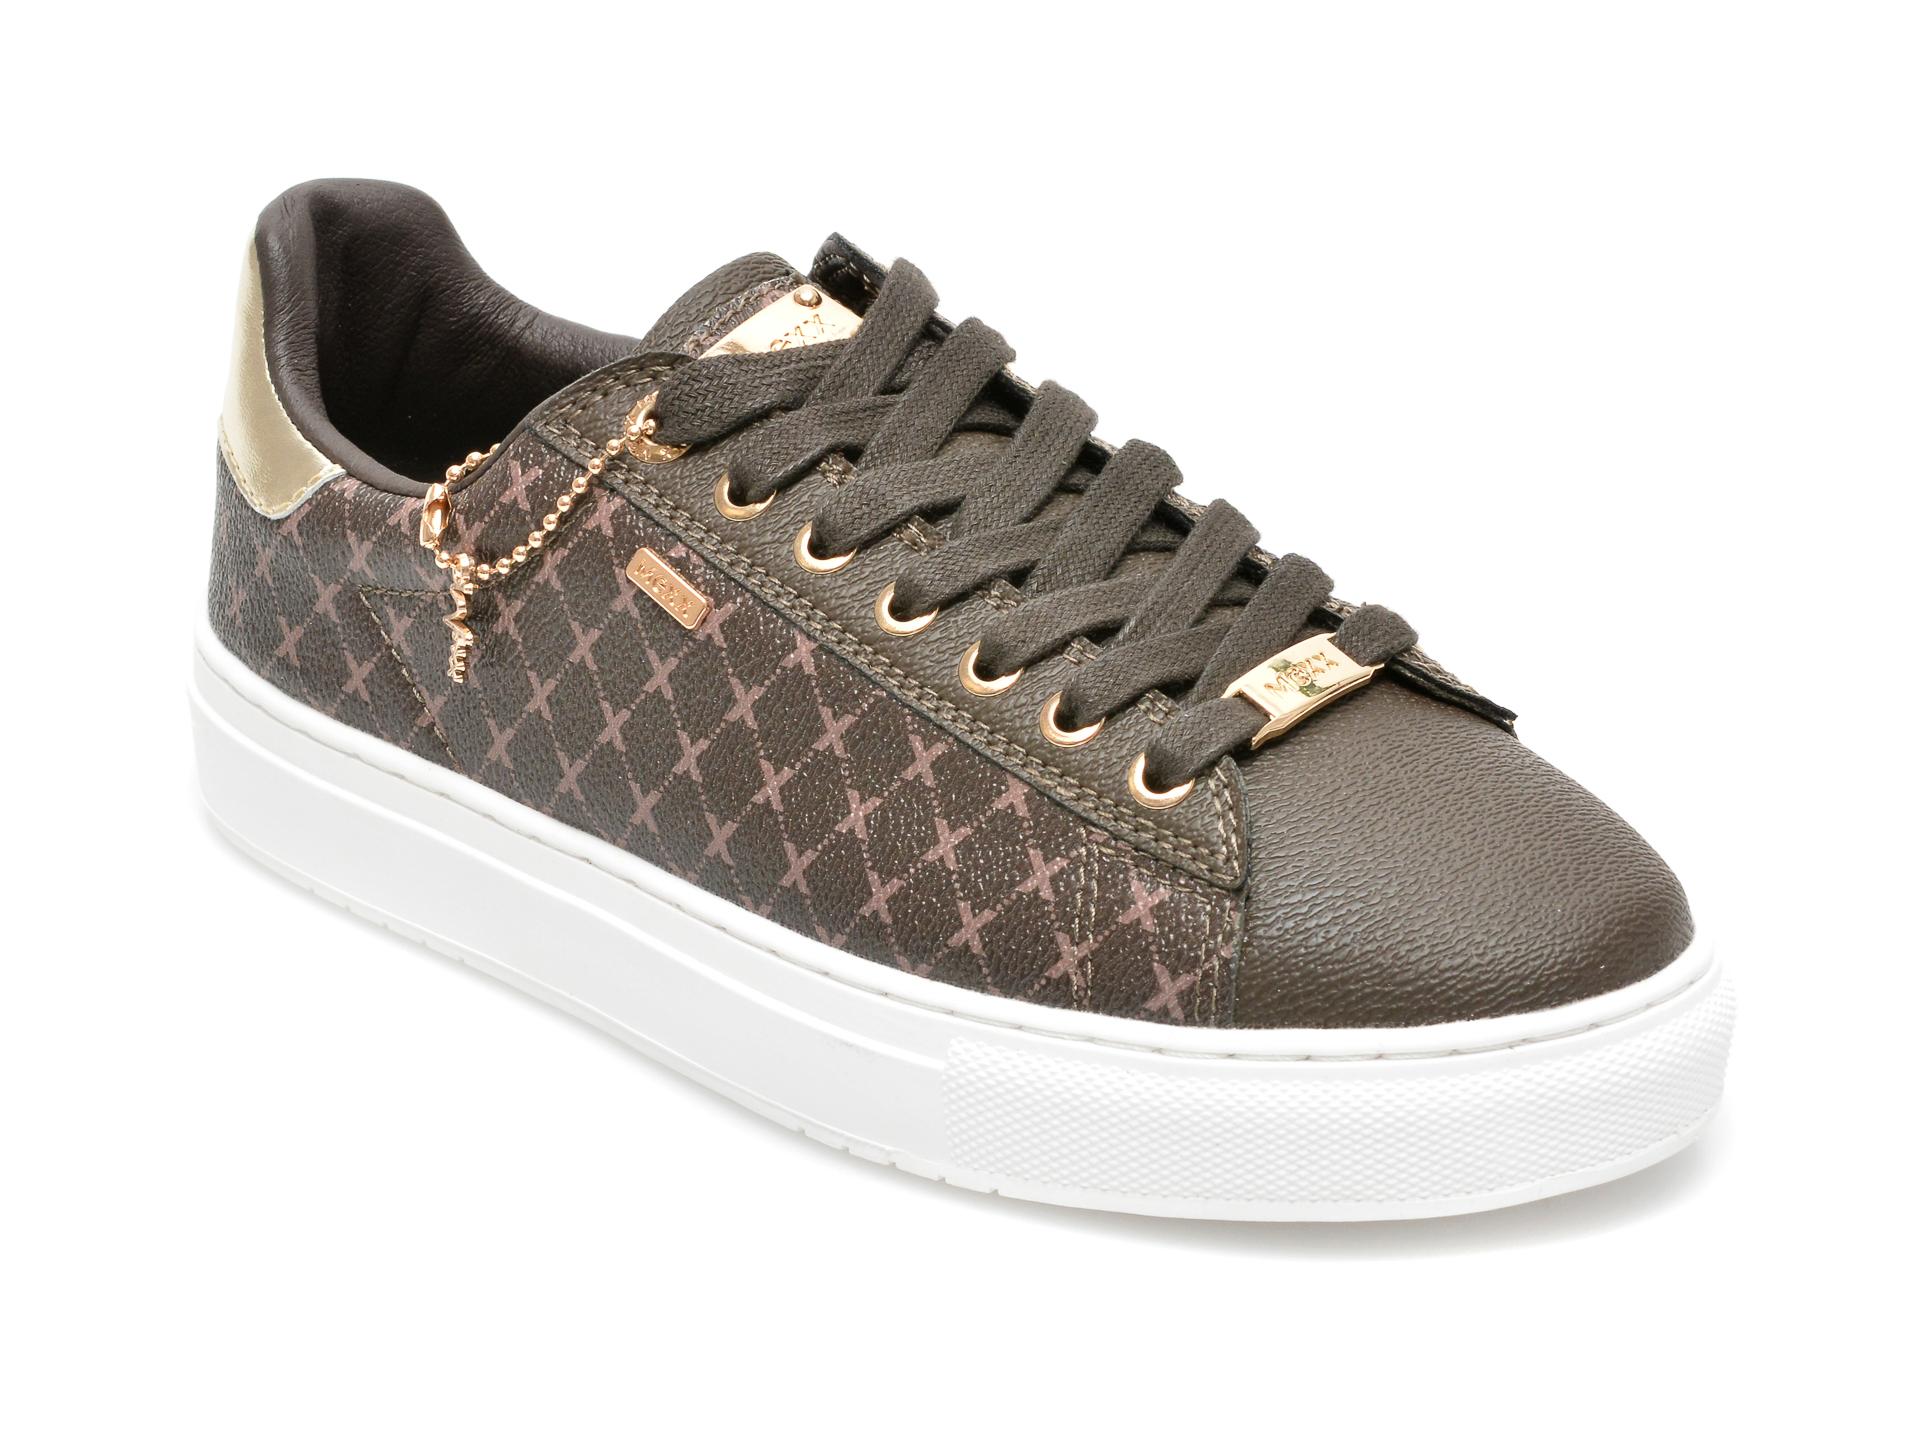 Pantofi sport MEXX maro, QP0318, din piele ecologica